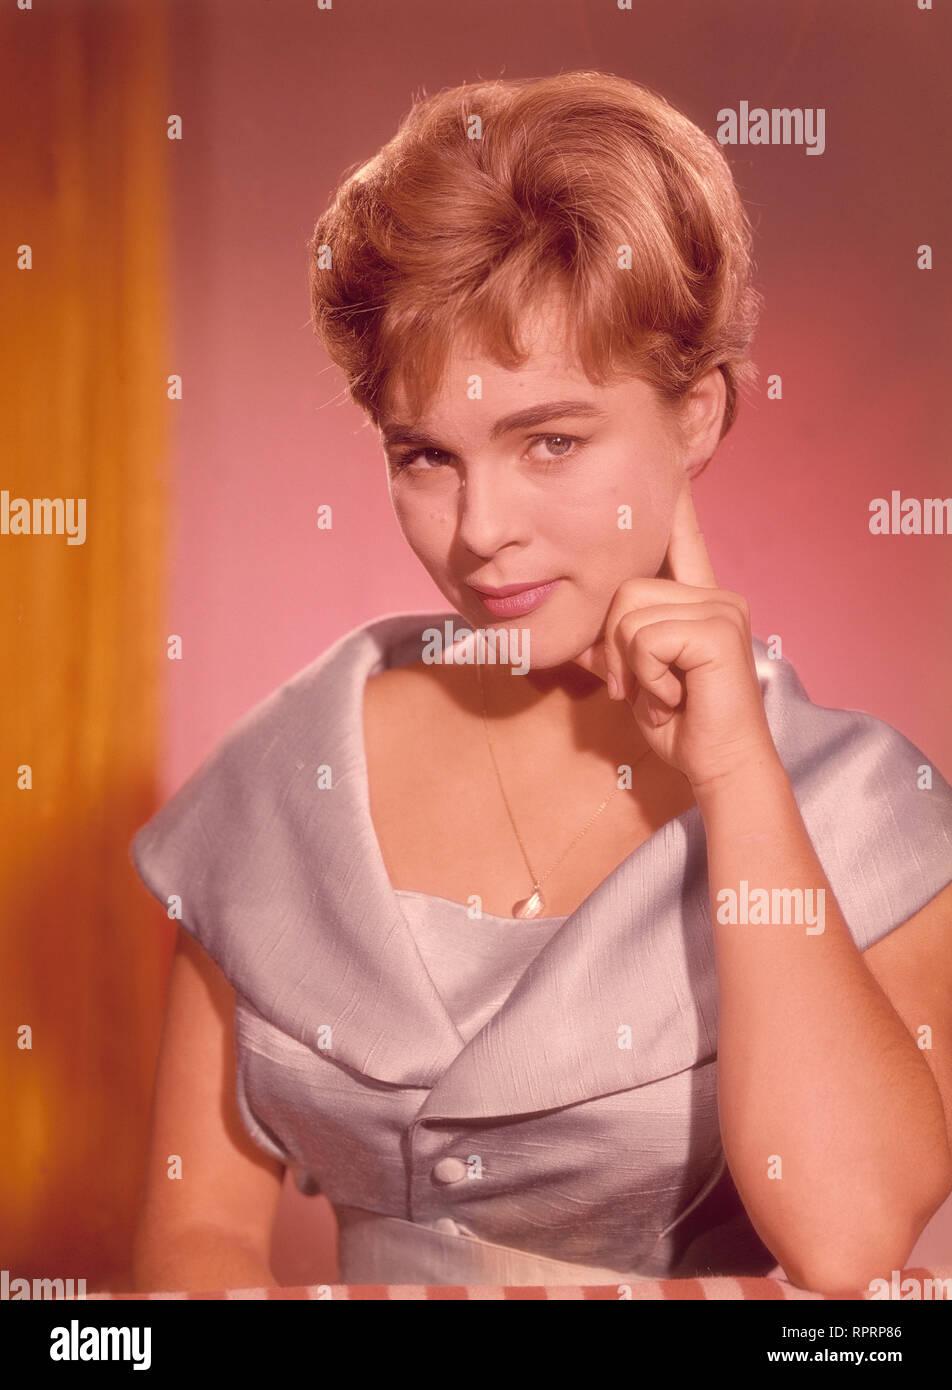 Conny Froboess Bilder cornelia (conny) froboess, studioaufnahme, 1959 stock photo